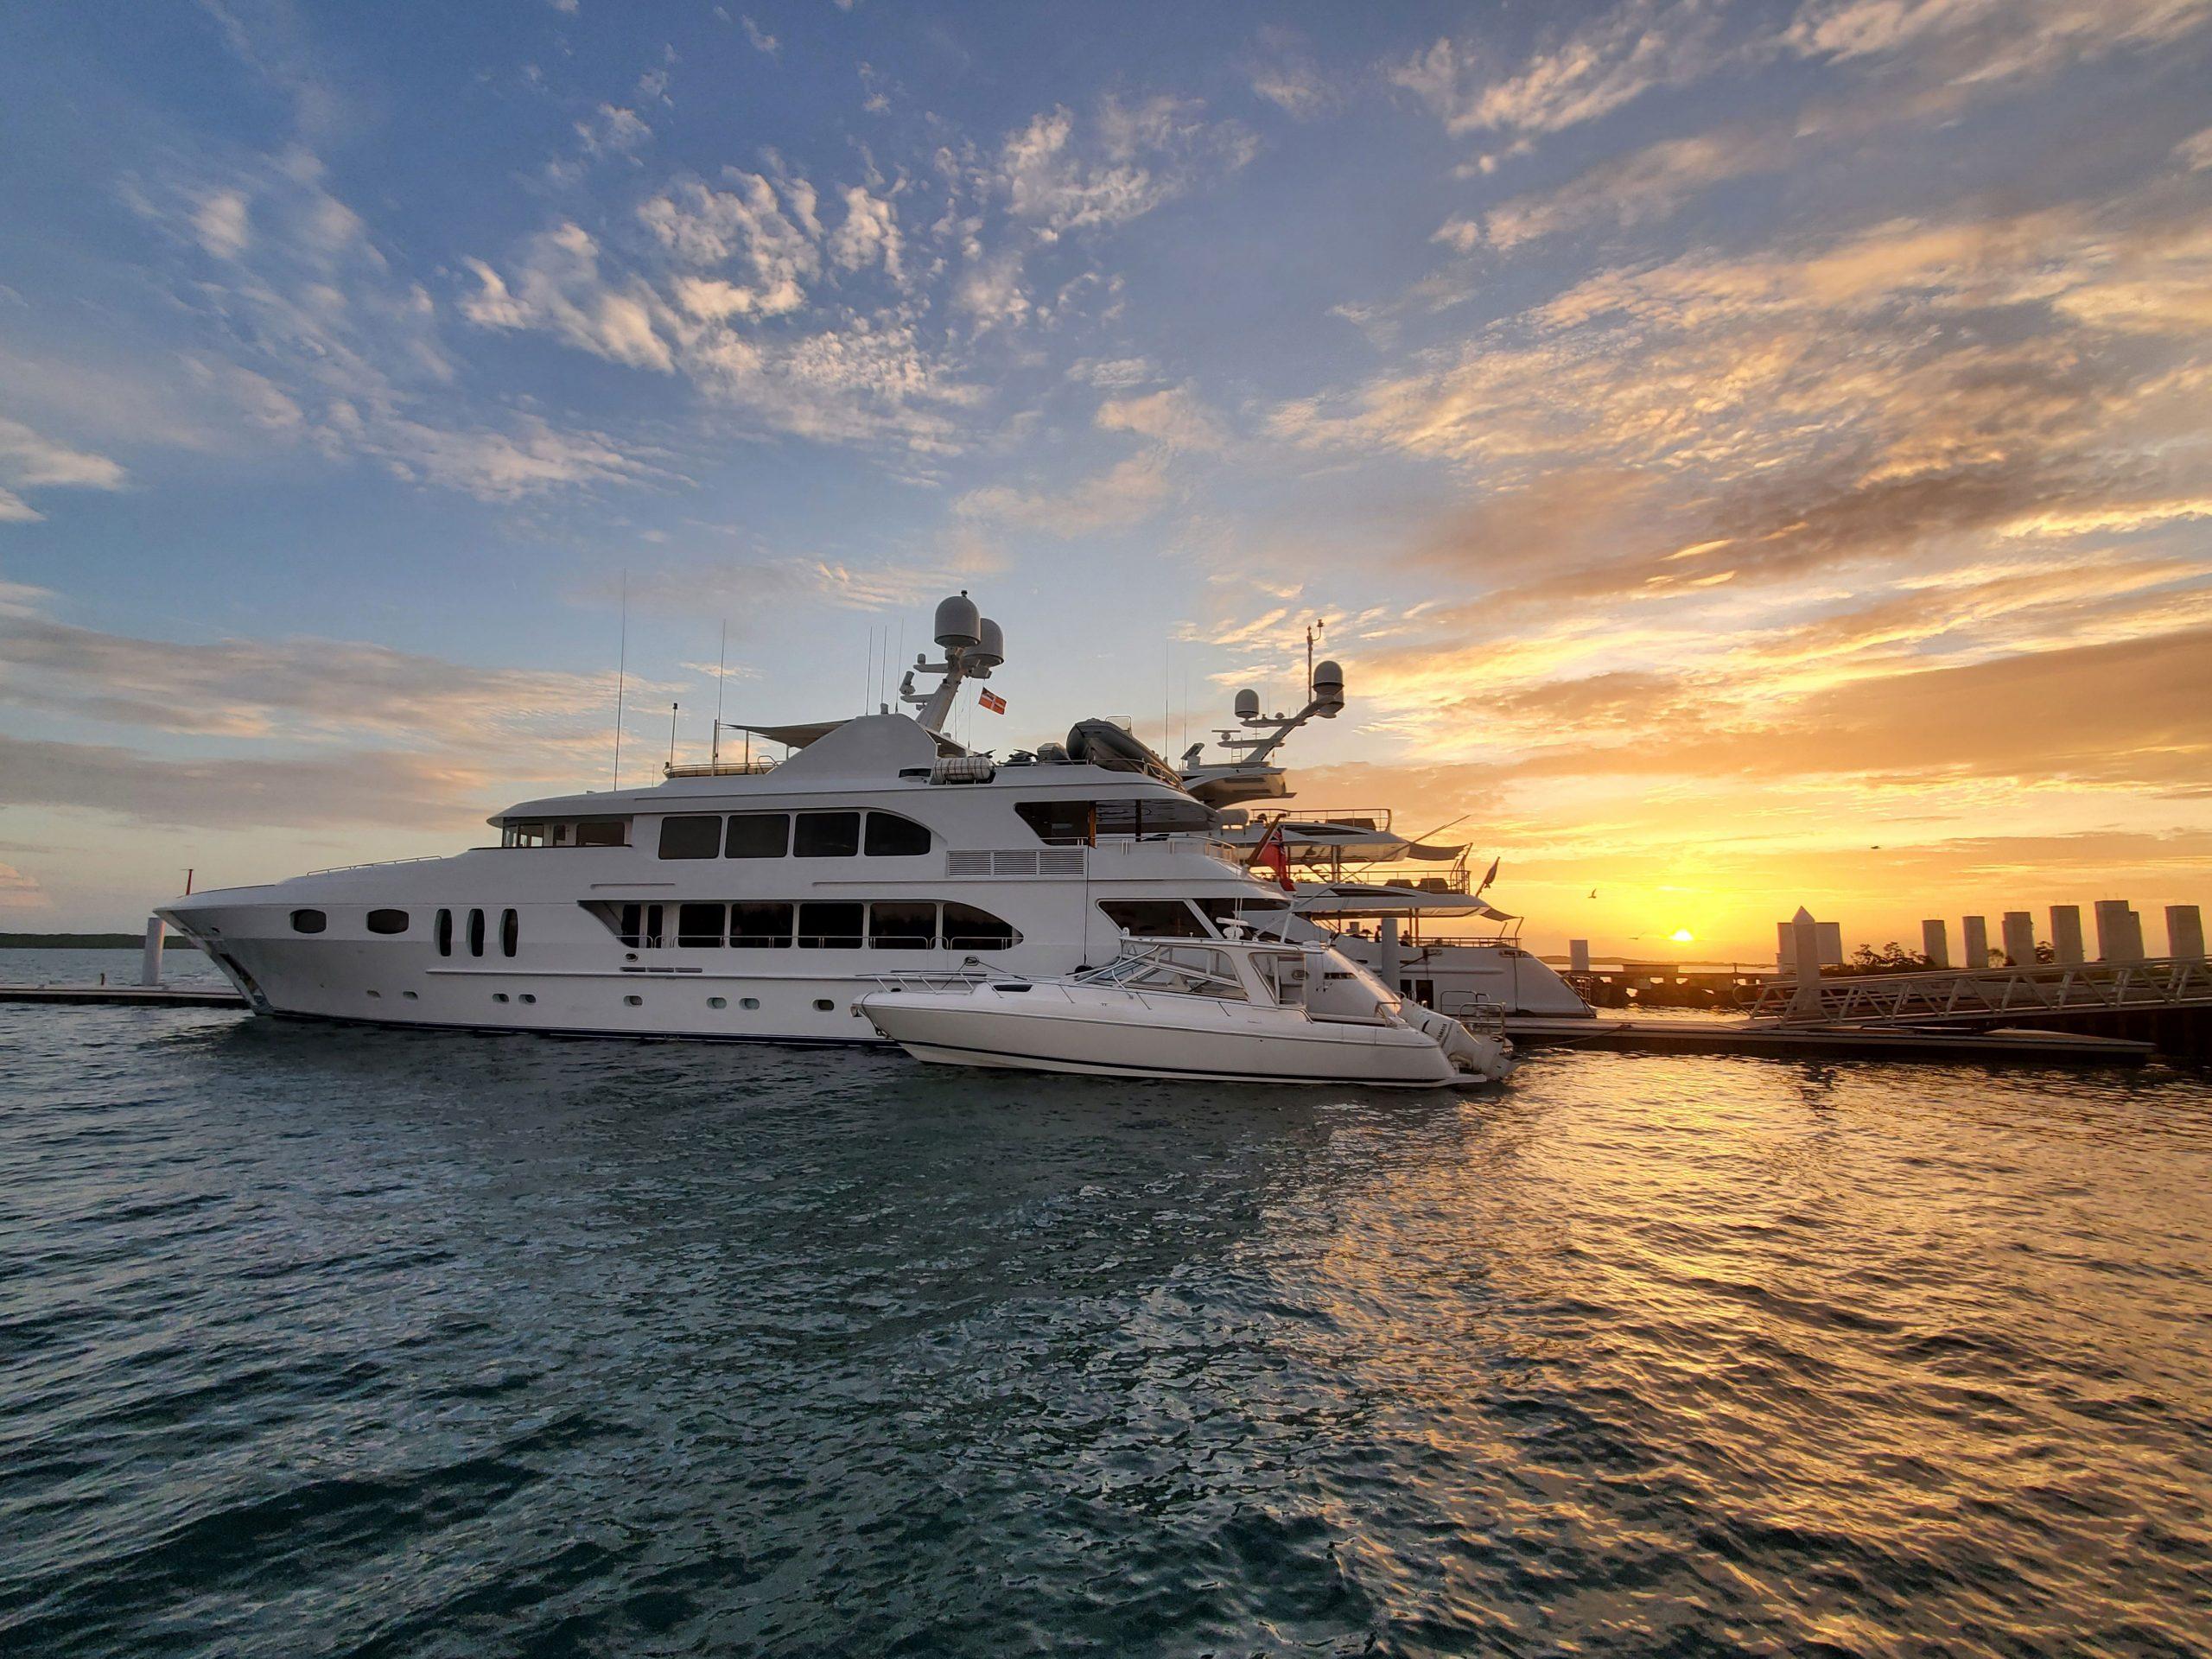 07-2021-Briland-Club-Marina-Sunset-over-boat